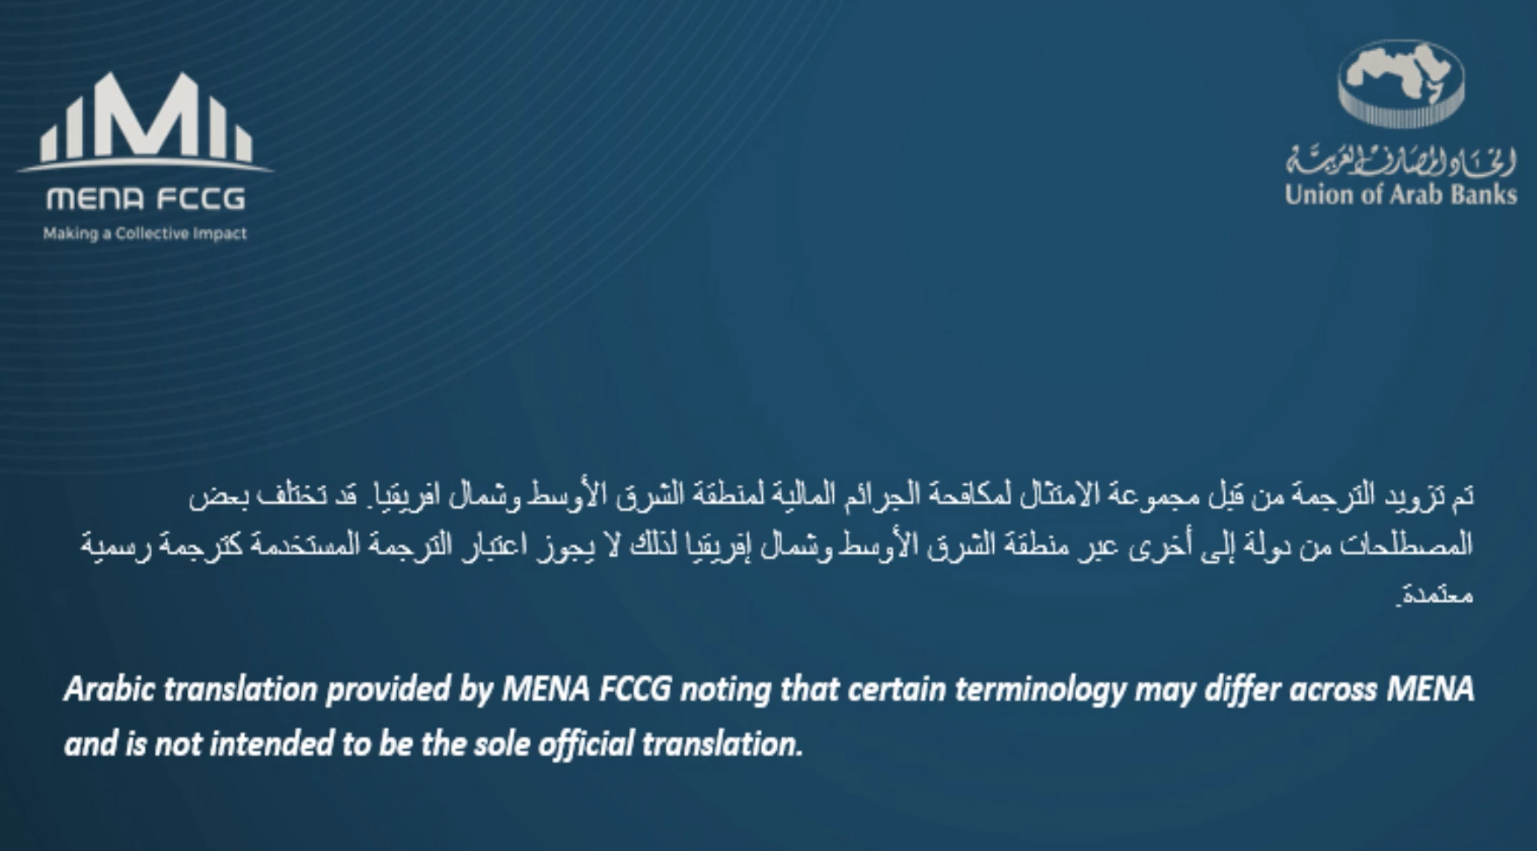 http://menafccg.com/wp-content/uploads/2020/09/5-Policies-and-procedures.png